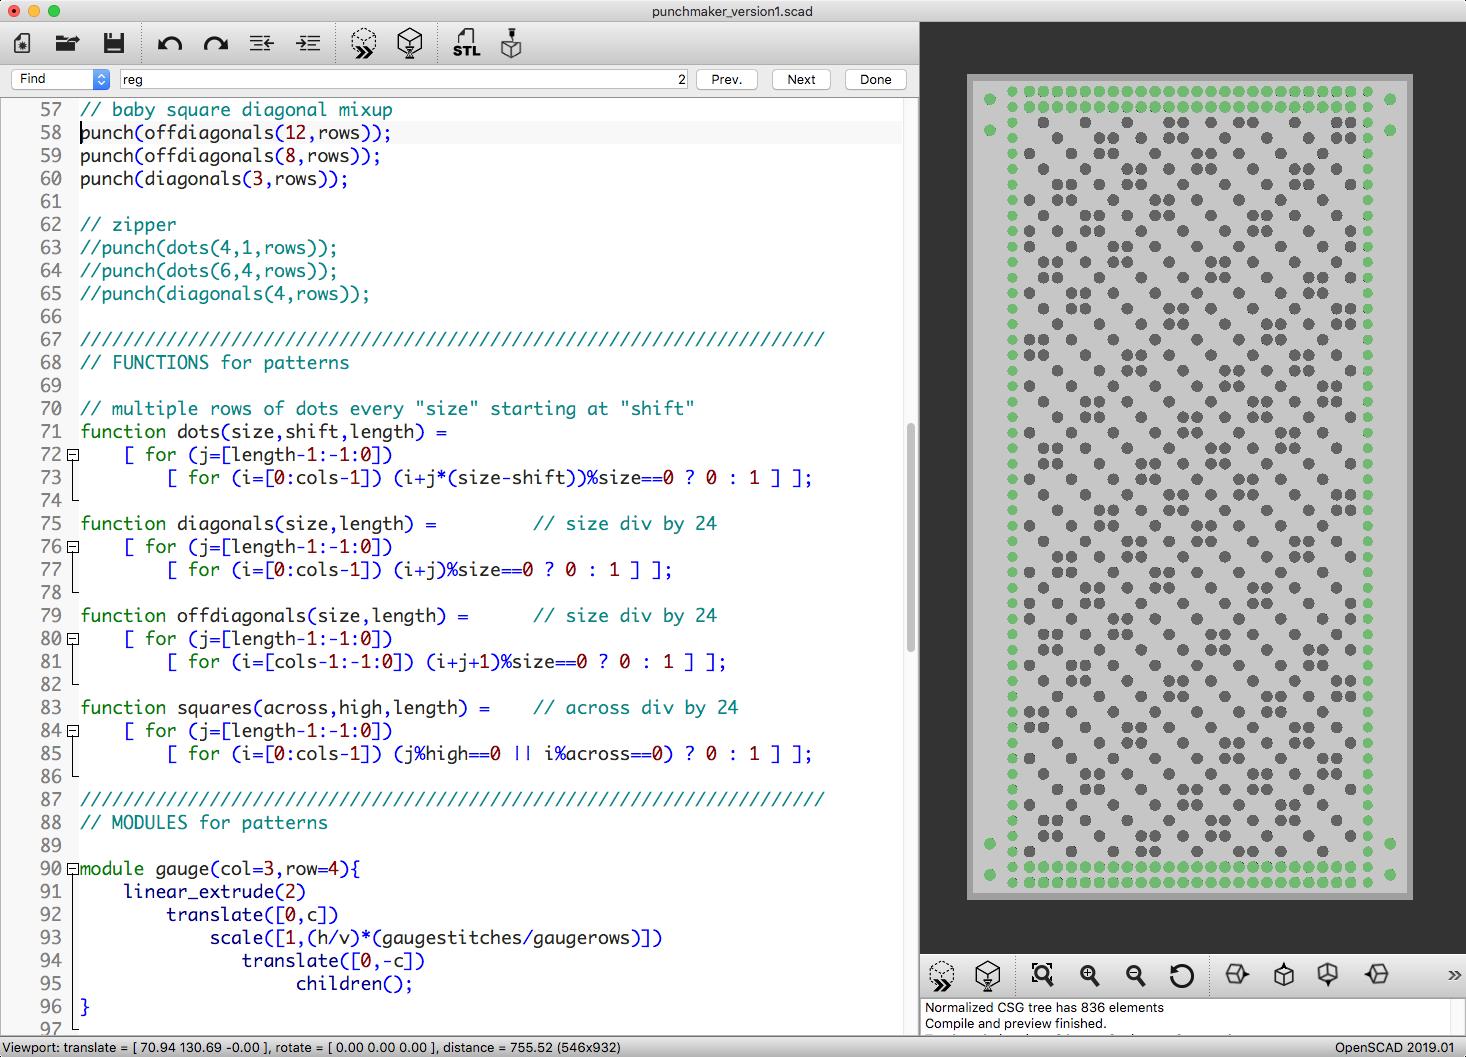 Punch Card Knitting Machine Patterns with OpenSCAD - mathgrrl